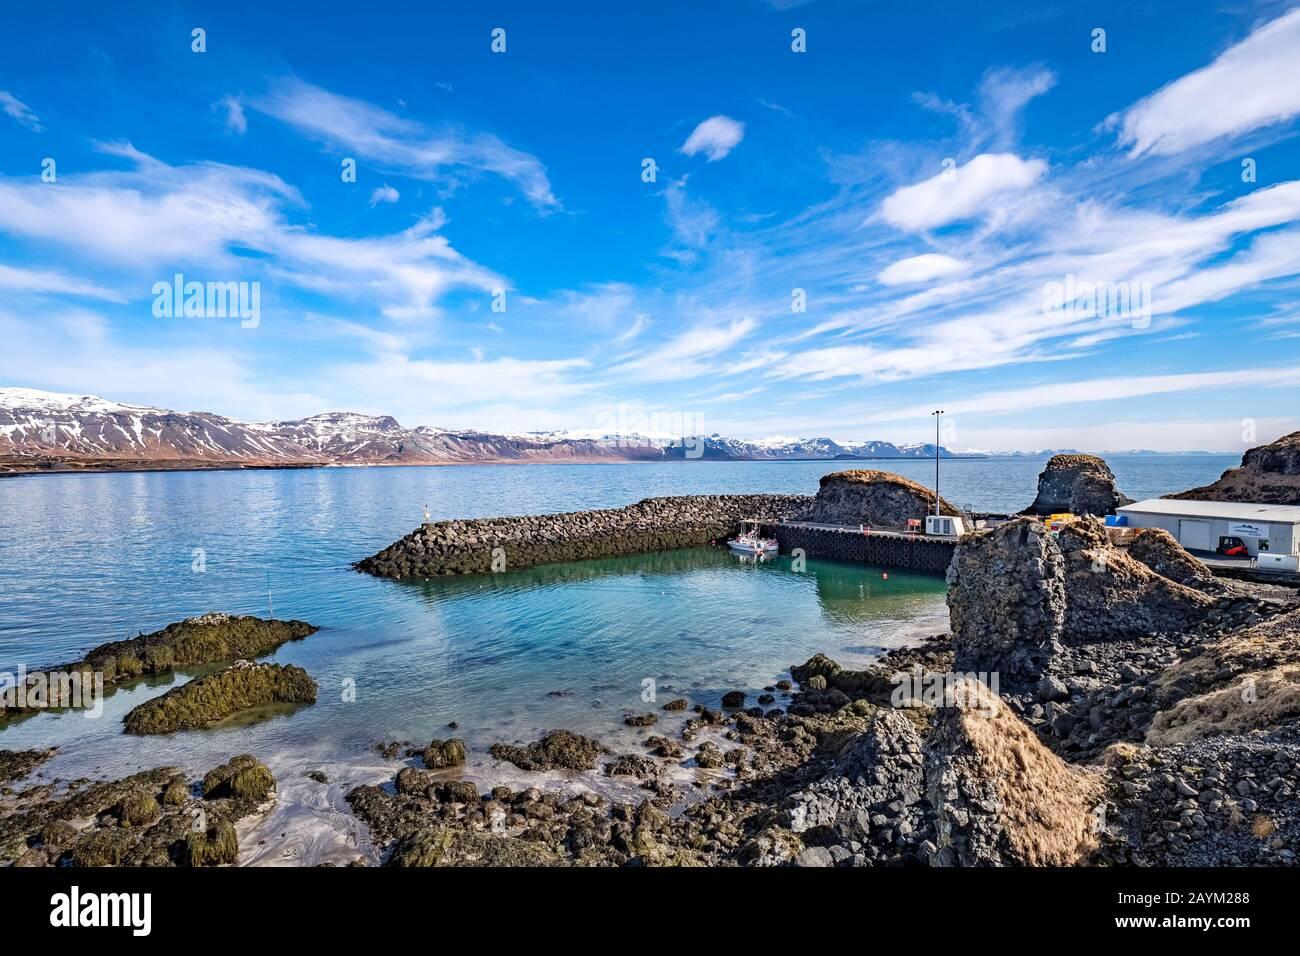 Harbour at Arnarstapi, on the Snaefellsnes Peninsula, West Iceland. Stock Photo